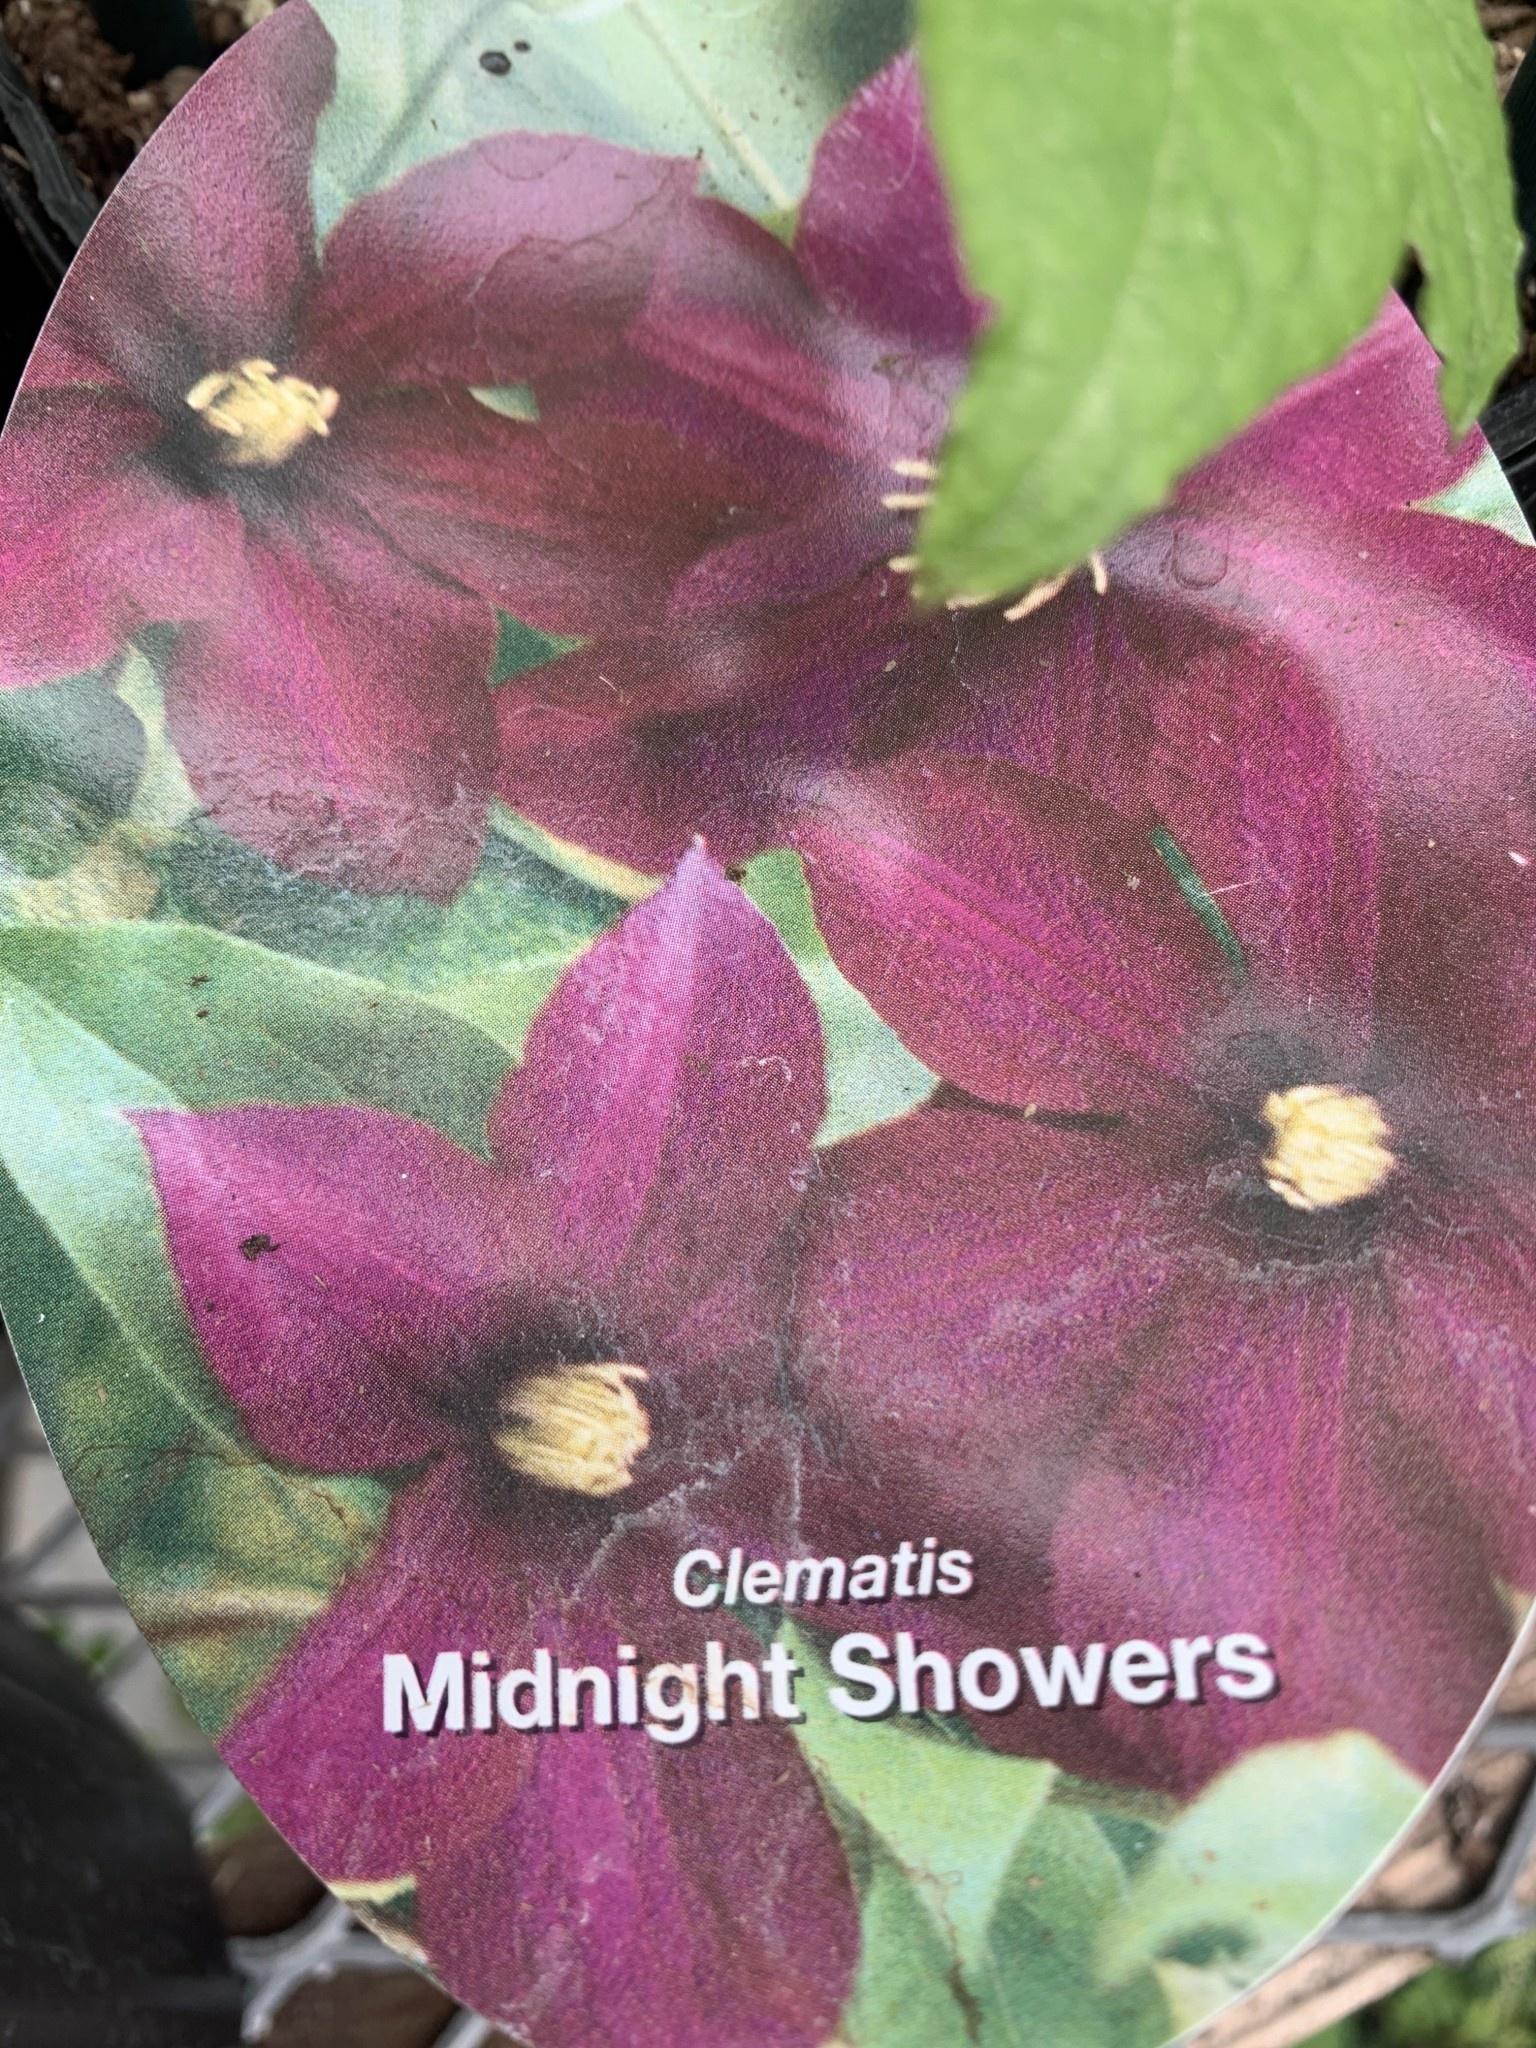 Clematis Midnight Showers, Clematis,  #1